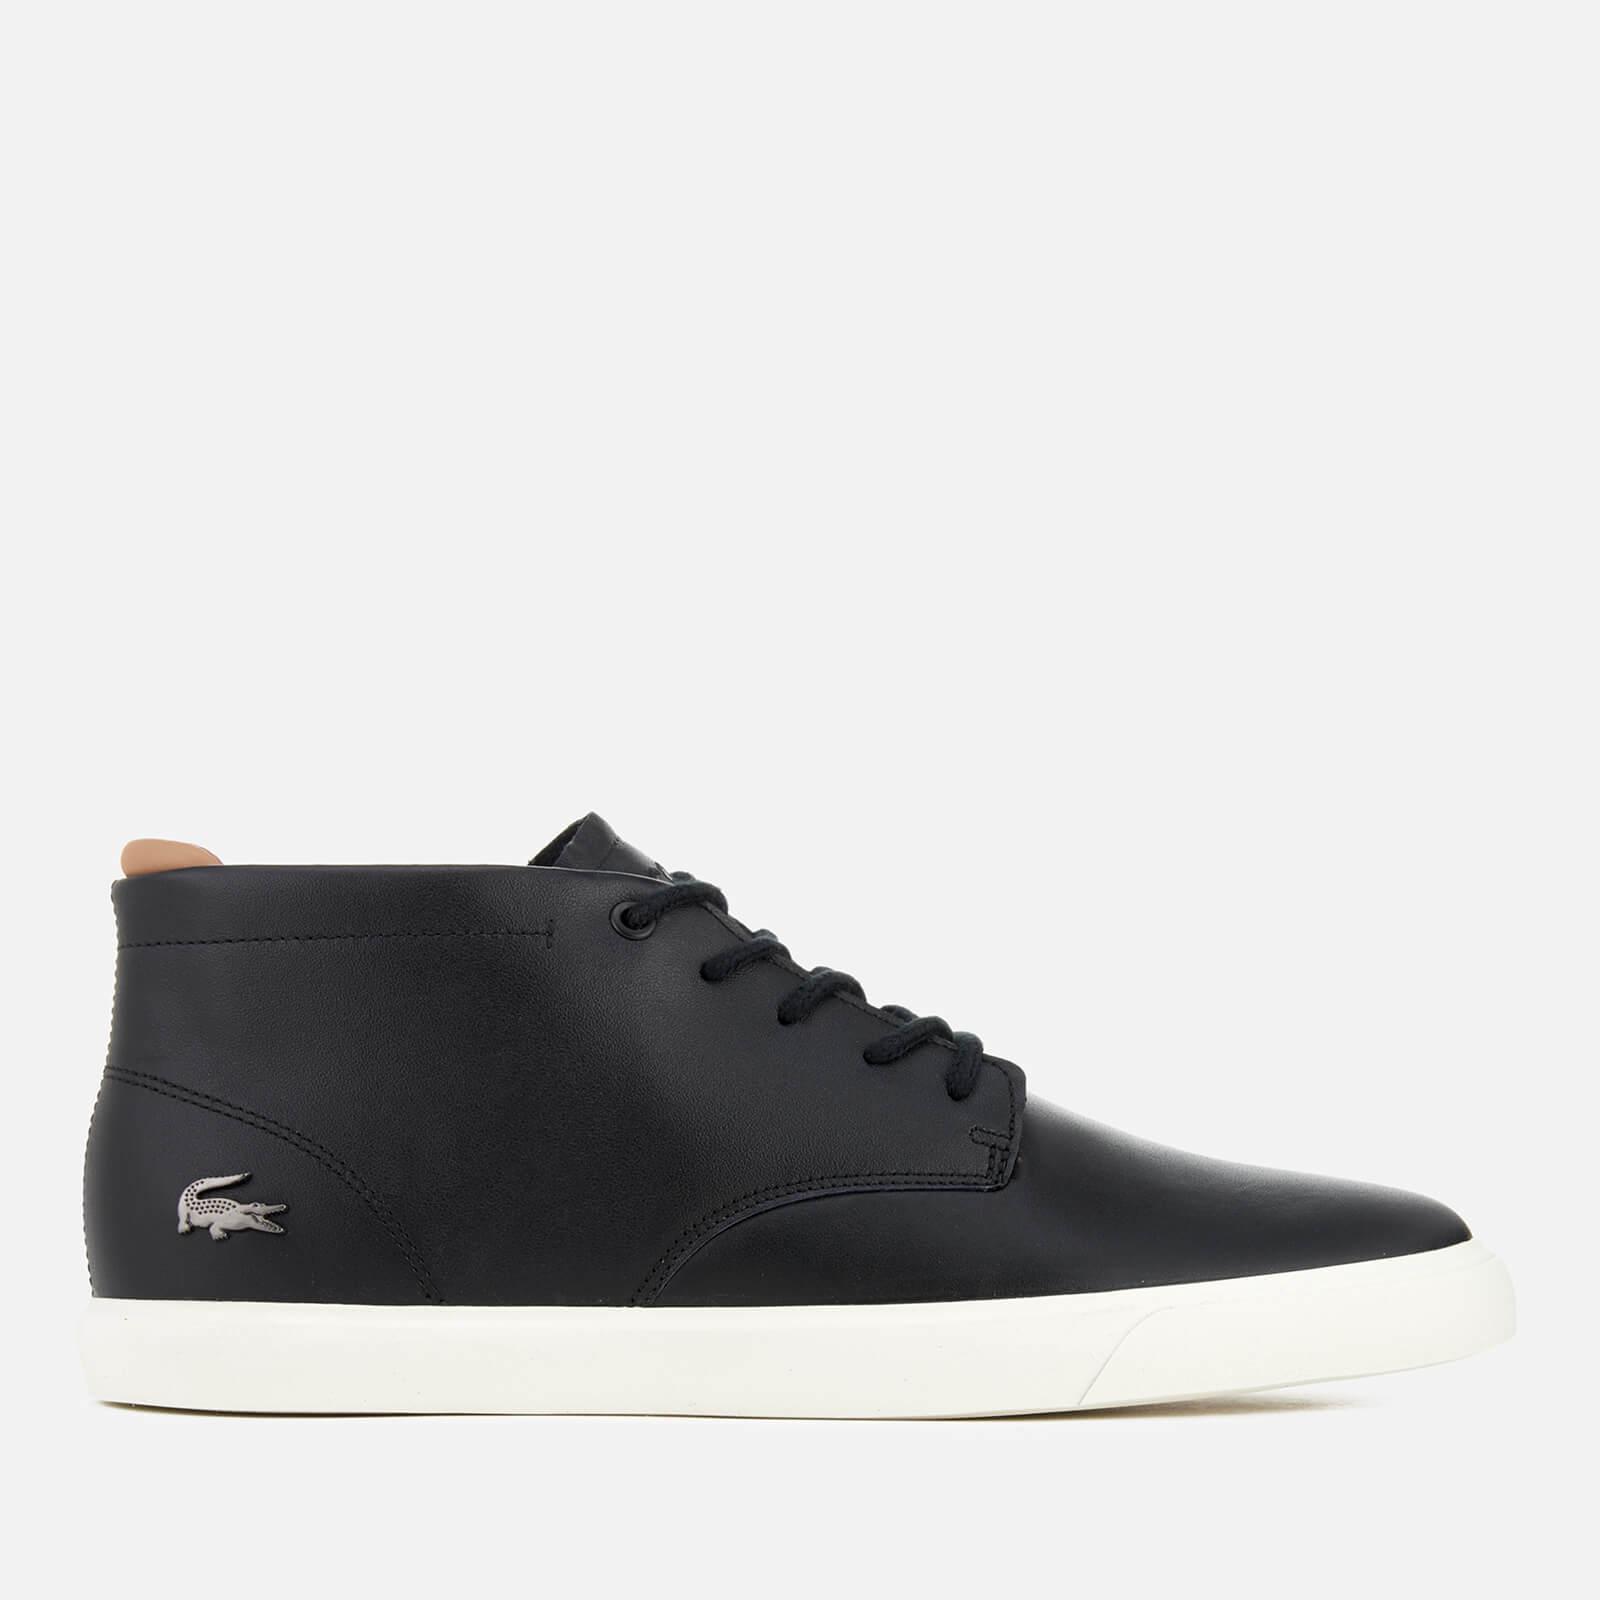 Lacoste Leather Espere Chukka 317 1